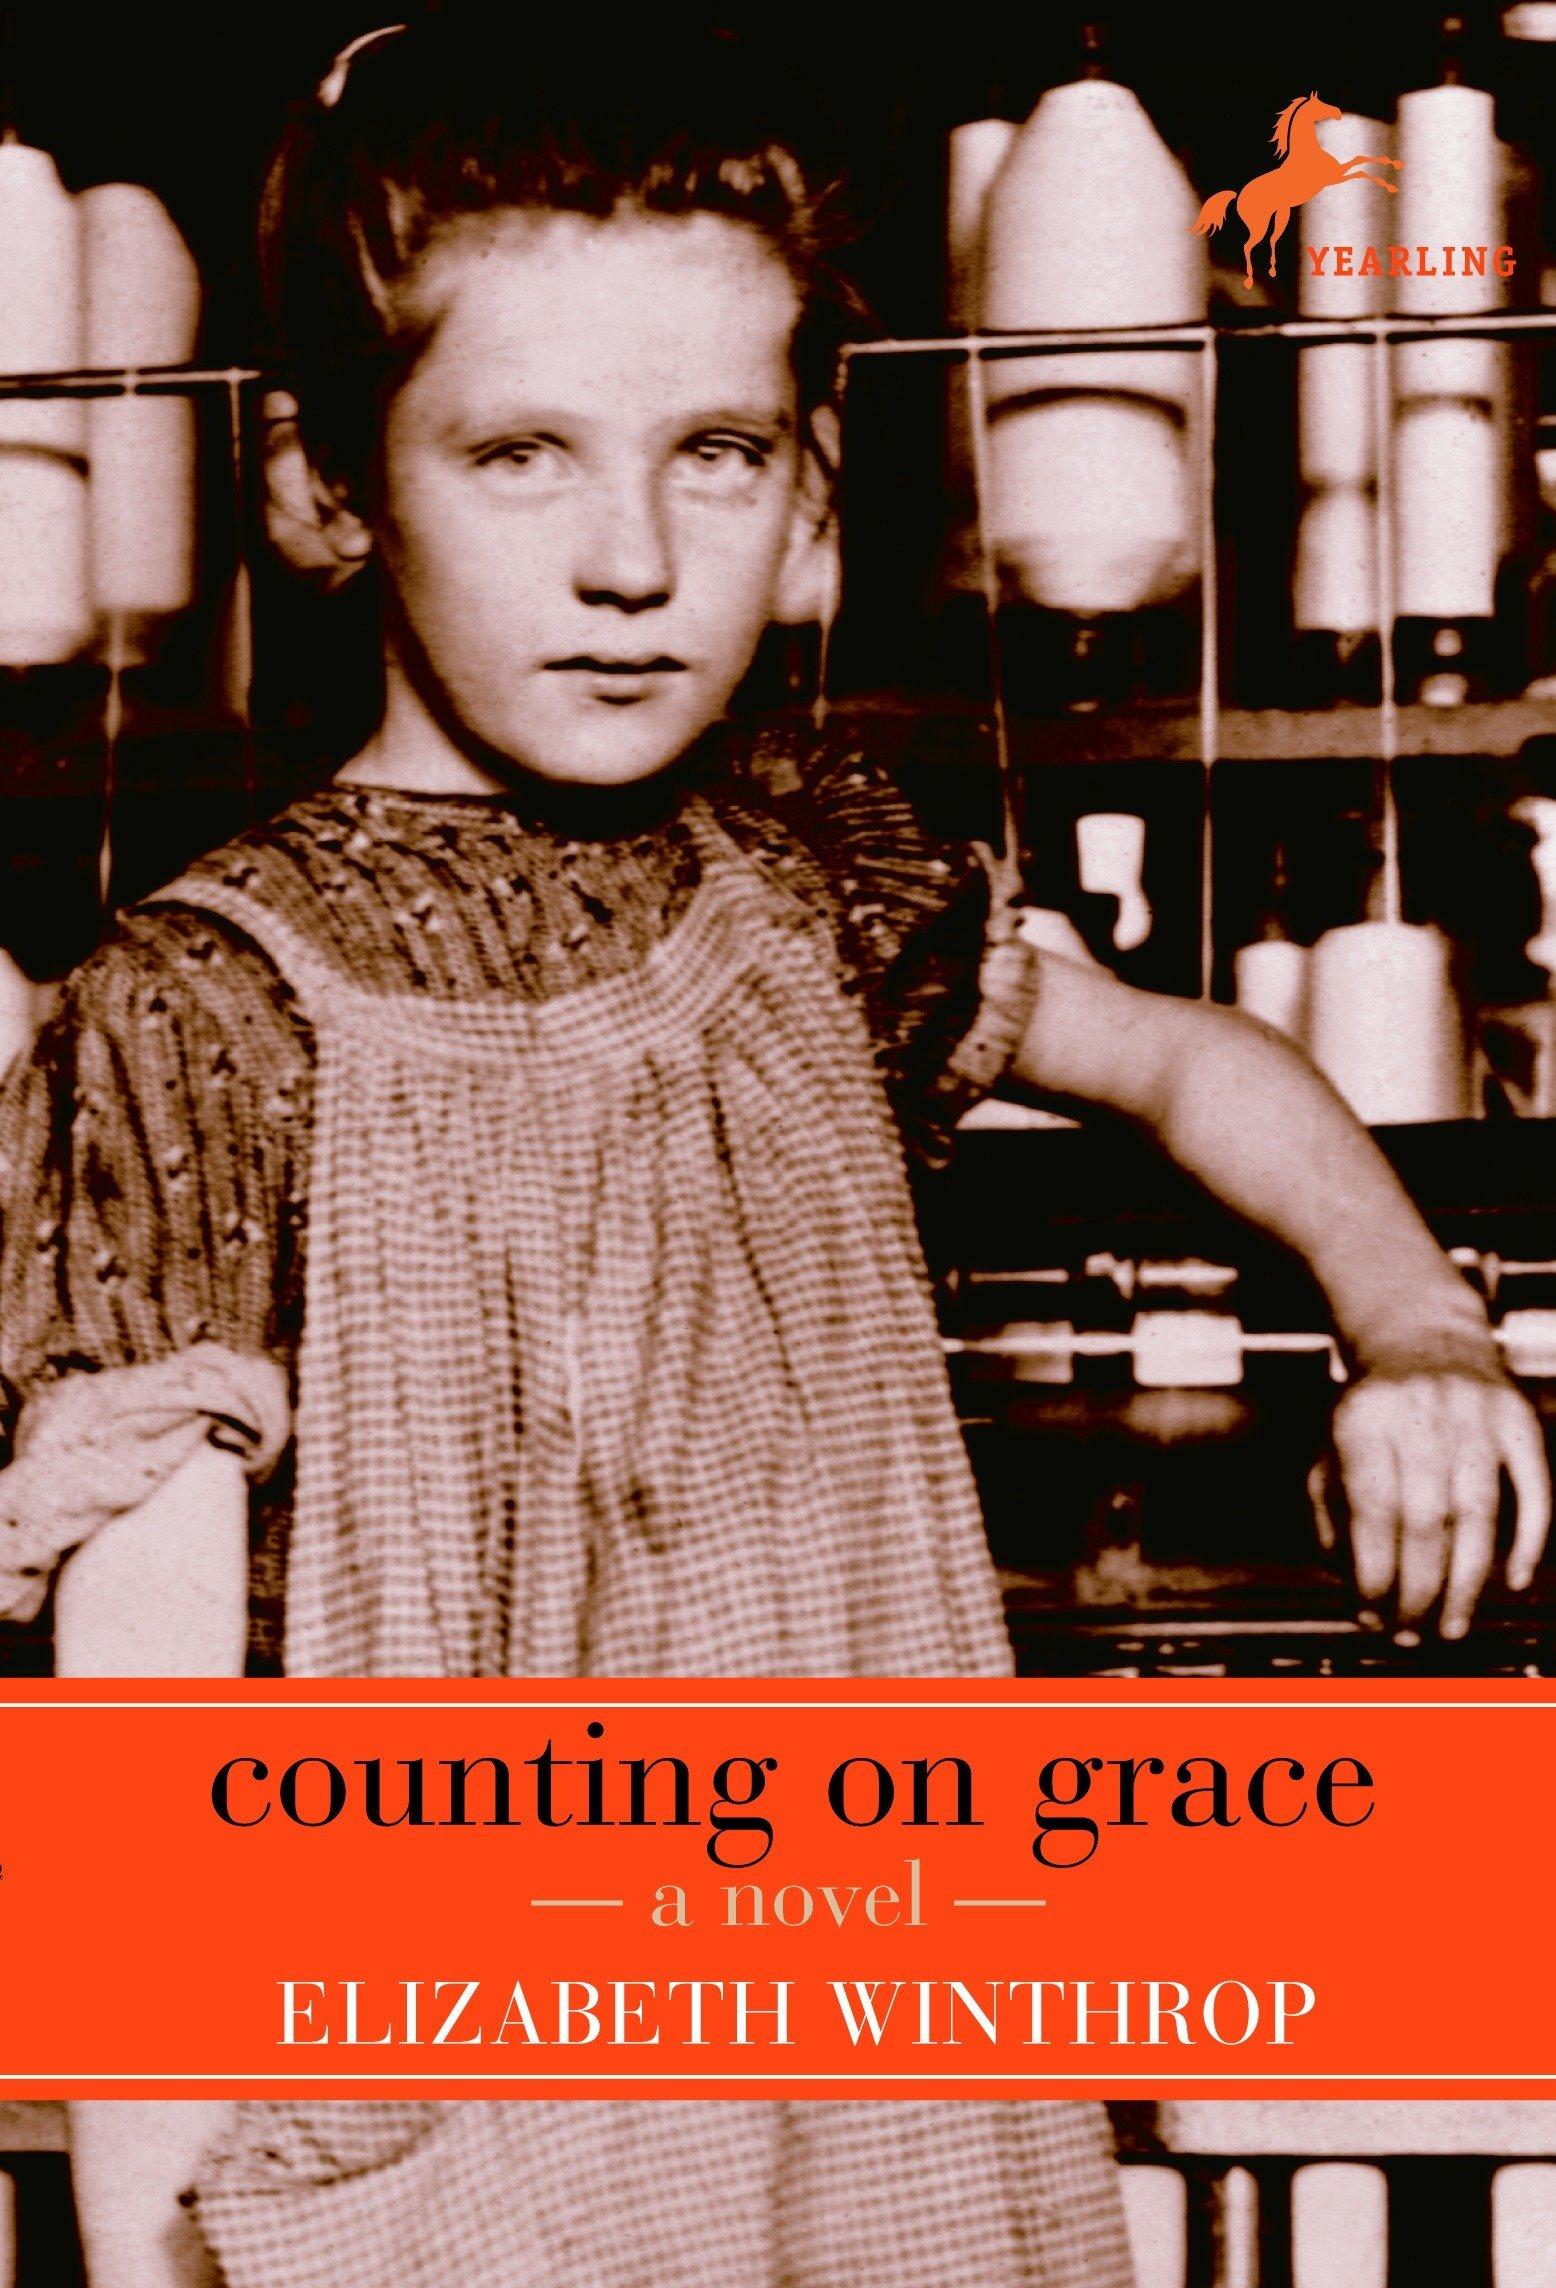 Counting on Grace: Winthrop, Elizabeth: 9780553487831: Amazon.com: Books